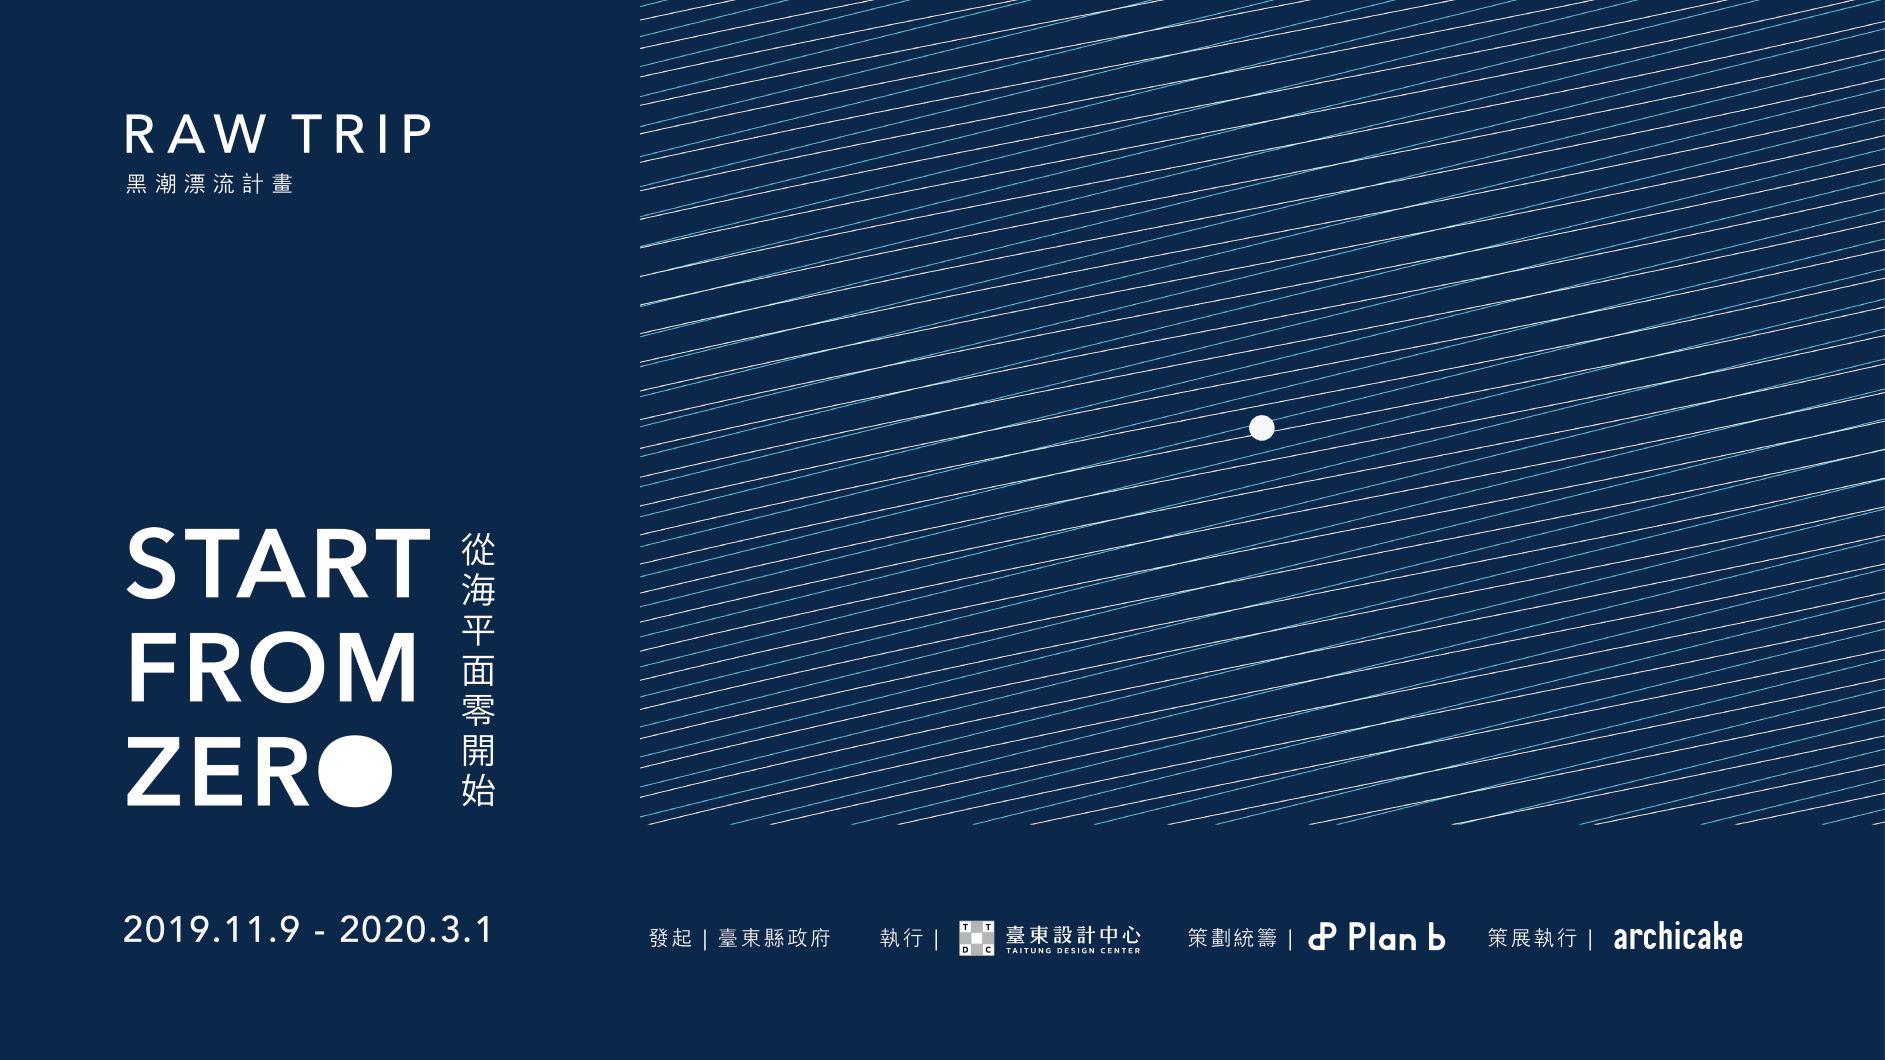 RAW TRIP2.0 臺東採集計畫-黑潮漂流 從海平面零開始 START FROM ZERO